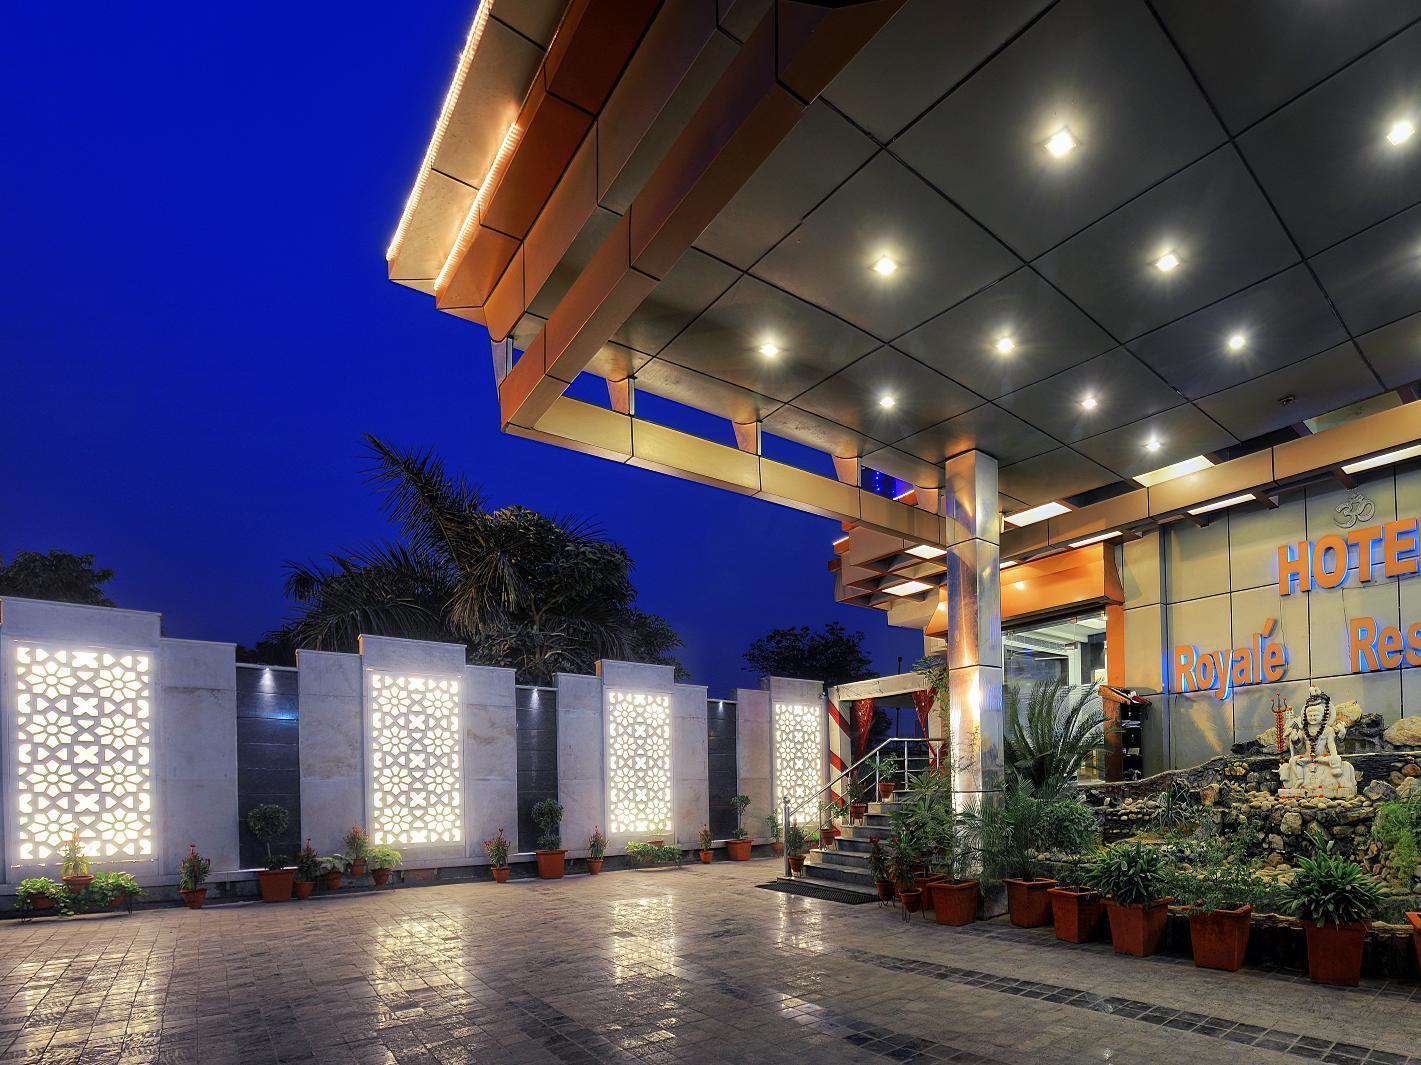 Royale Residency Hotel - Hotell och Boende i Indien i Agra